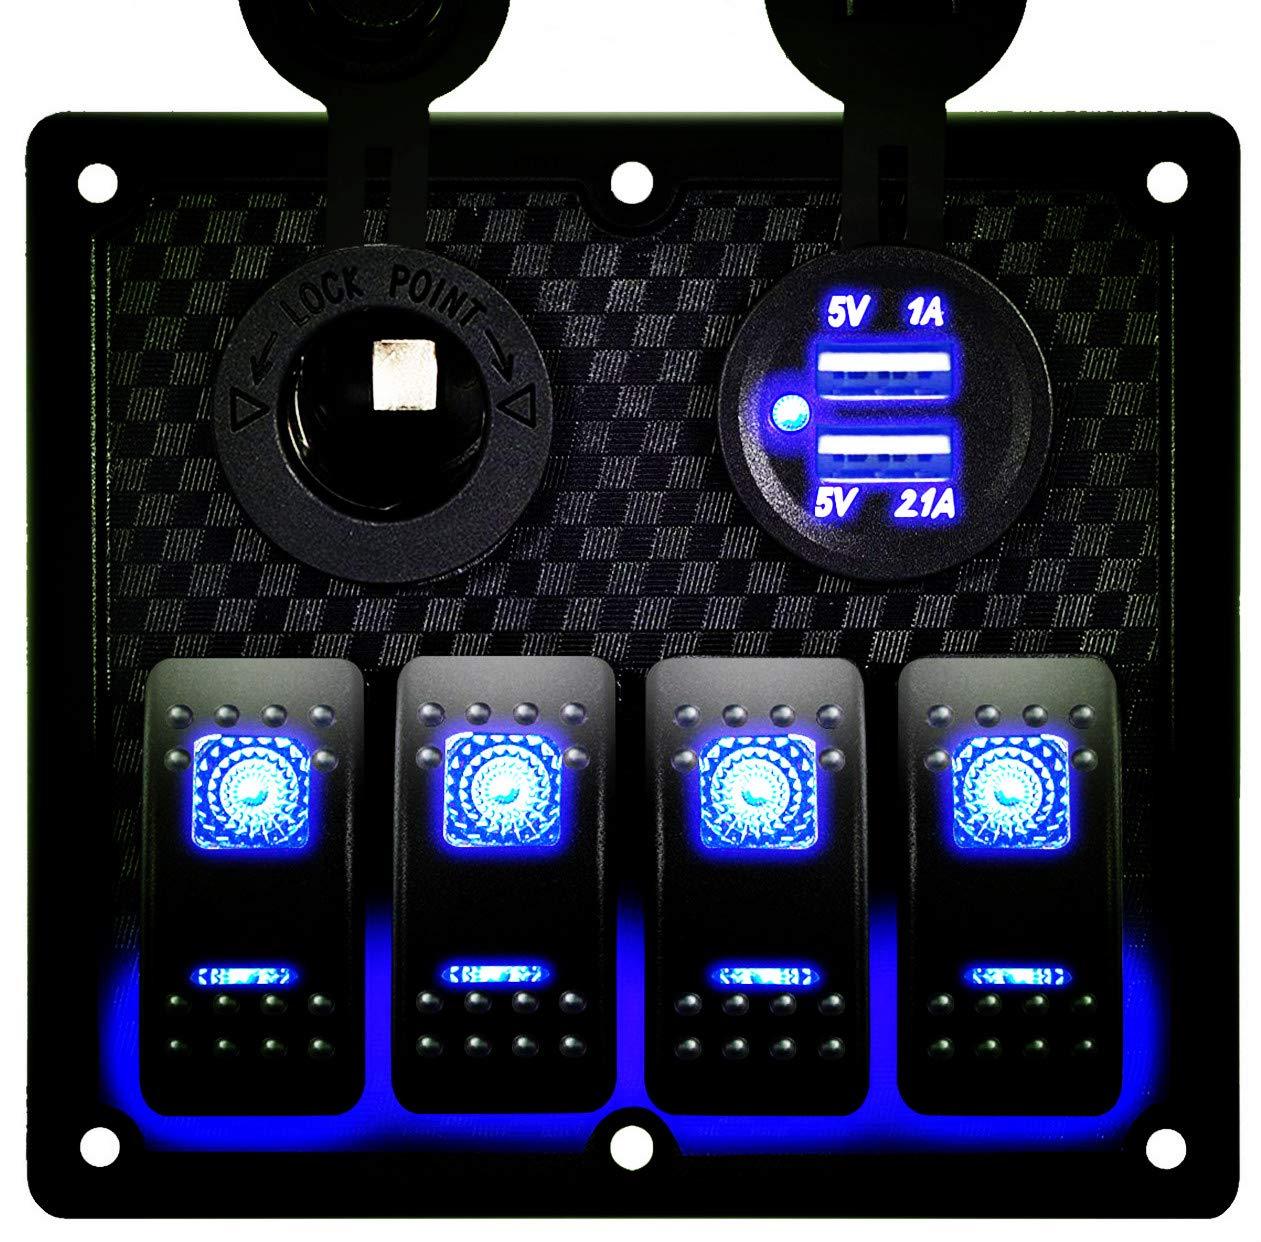 DCFlat 5 Pin 4 Gang LED Car Marine Boat Rocker Switch Panel Dual USB Waterproof Power Socket by DCFlat